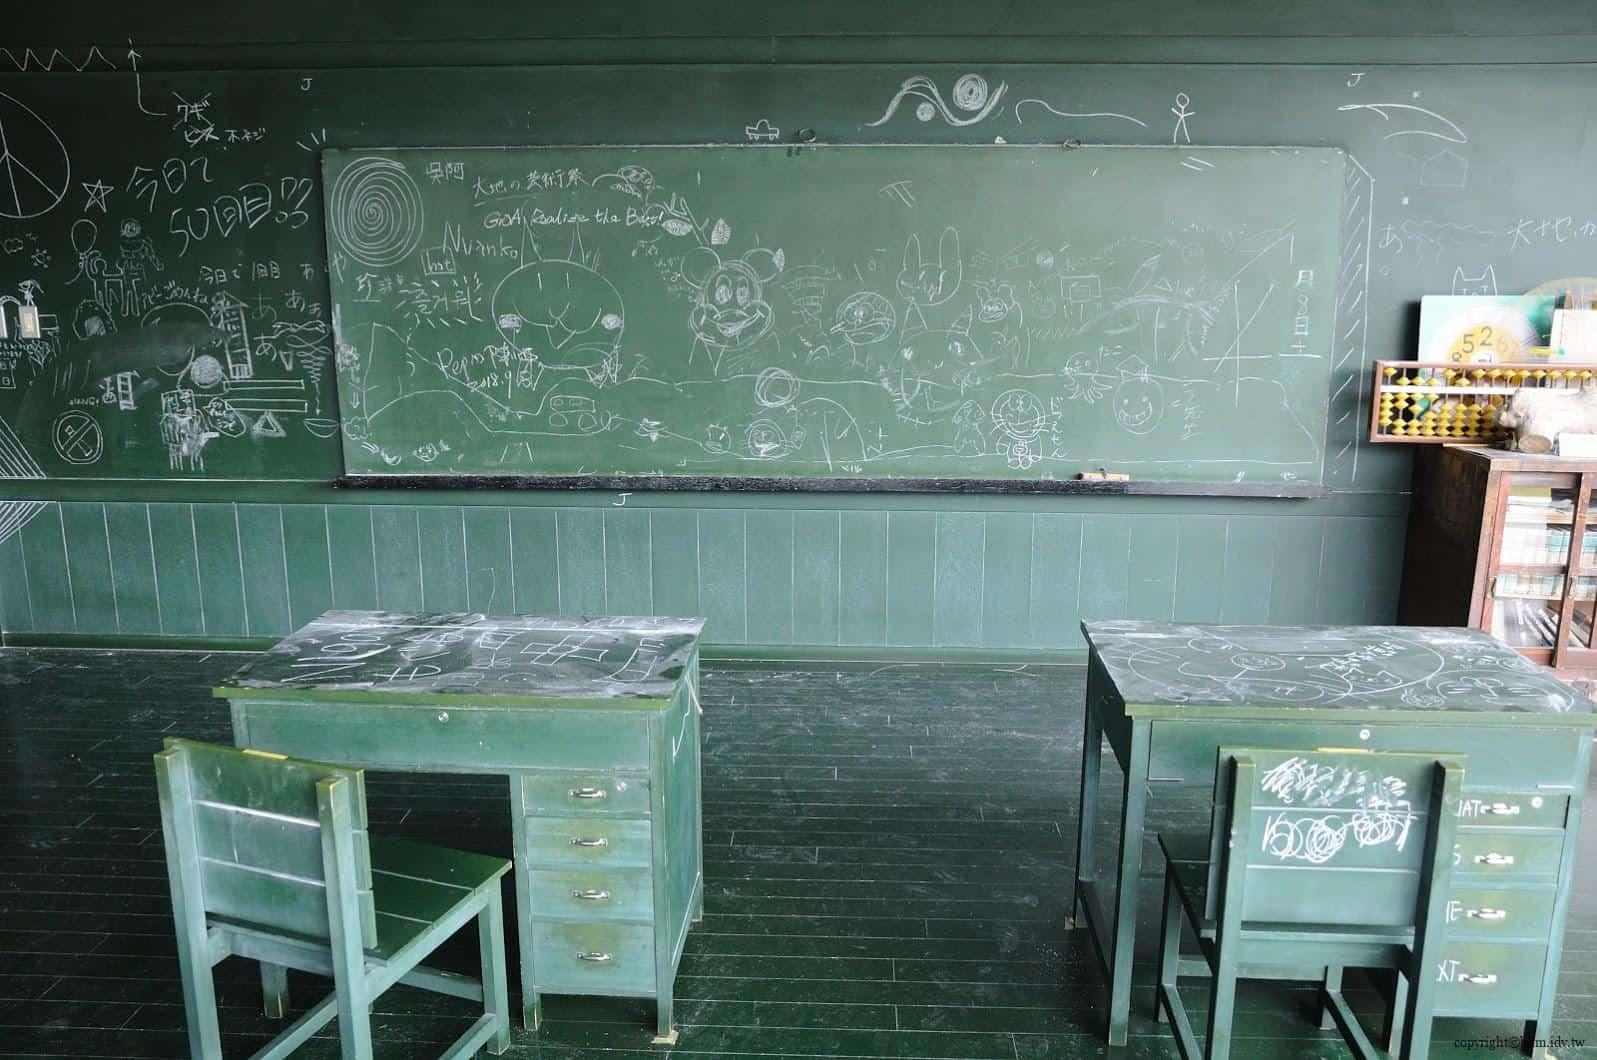 MVRDV,松代雪國農耕文化村[農舞臺],関係-黒板の教室」(教育空間),「如果教室內全都是黑板?那該有多好」於是,作者創作出此作品,無論所見之處牆壁、地板、地圖、地球儀等,所有物品都可以使用粉筆寫字畫圖 松代雪國農耕文化村[農舞臺] 松代雪國農耕文化村[農舞臺] no butai snow land agrarian culture center matsudai 13